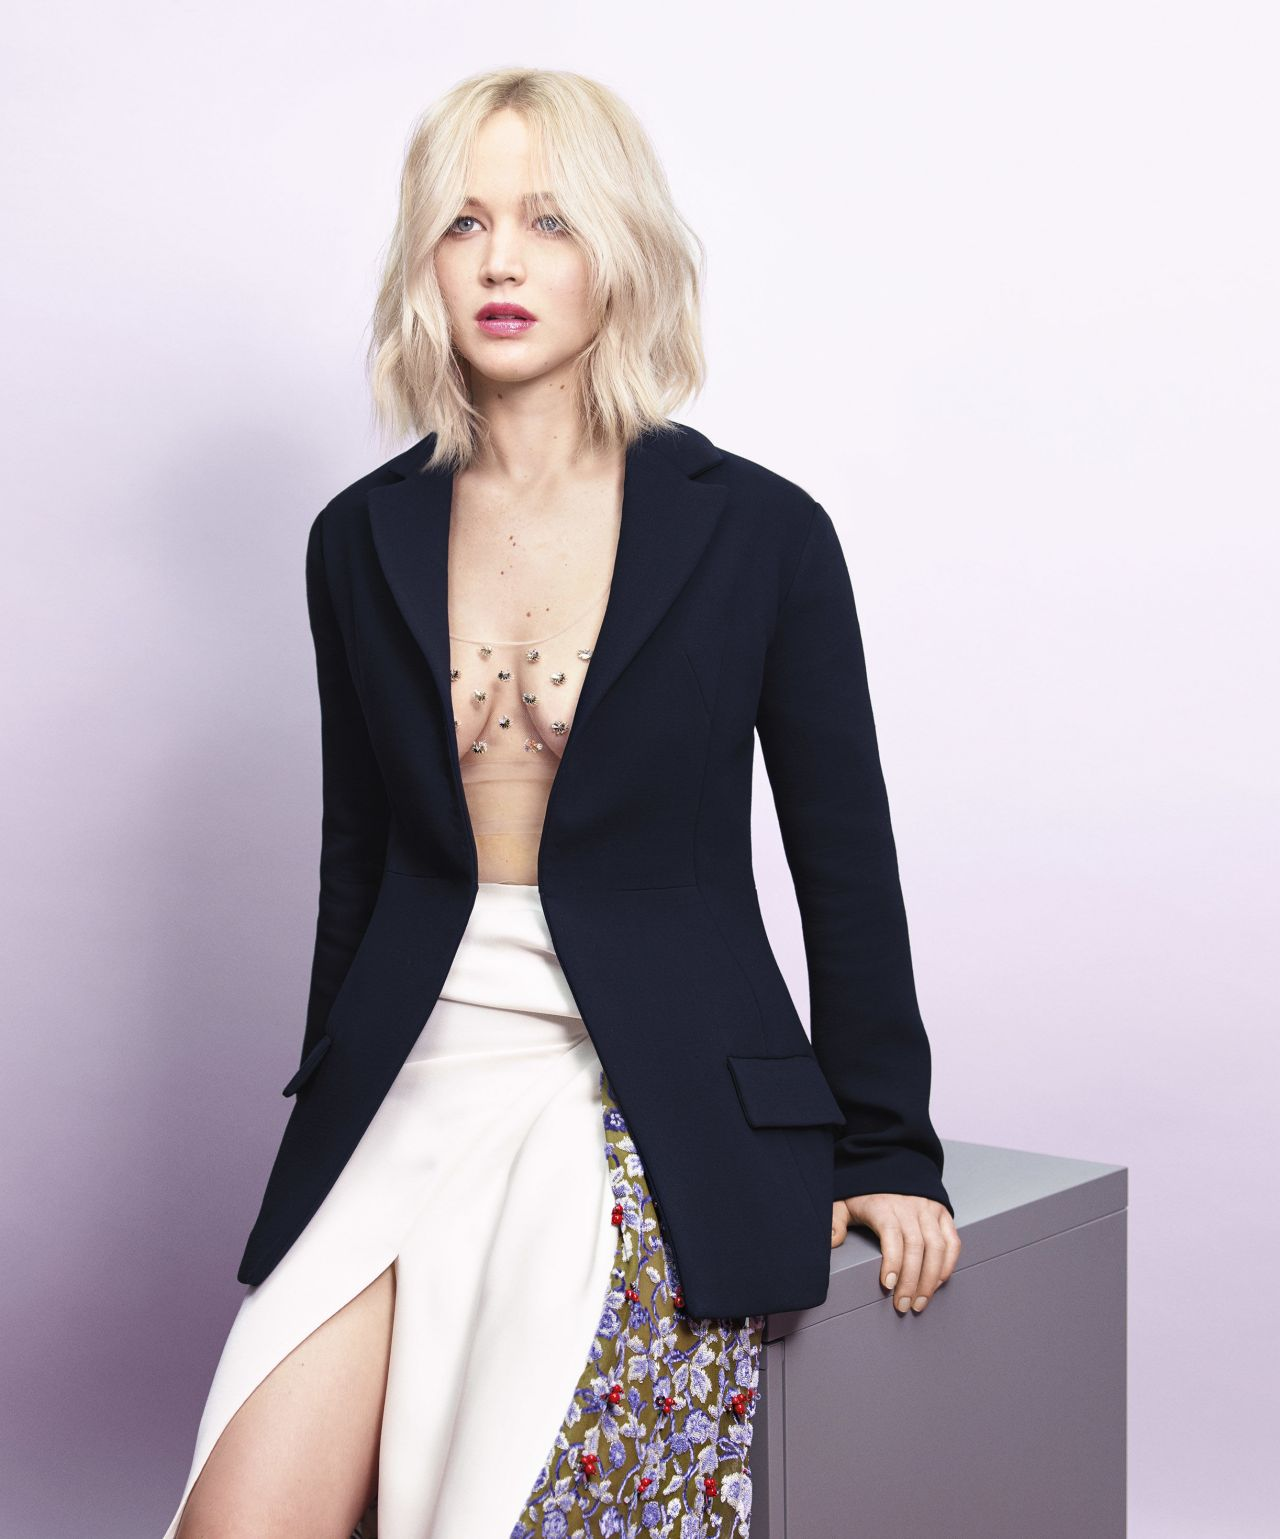 Jennifer Lawrence - Photo Shoot For Harpers Bazaar -8371